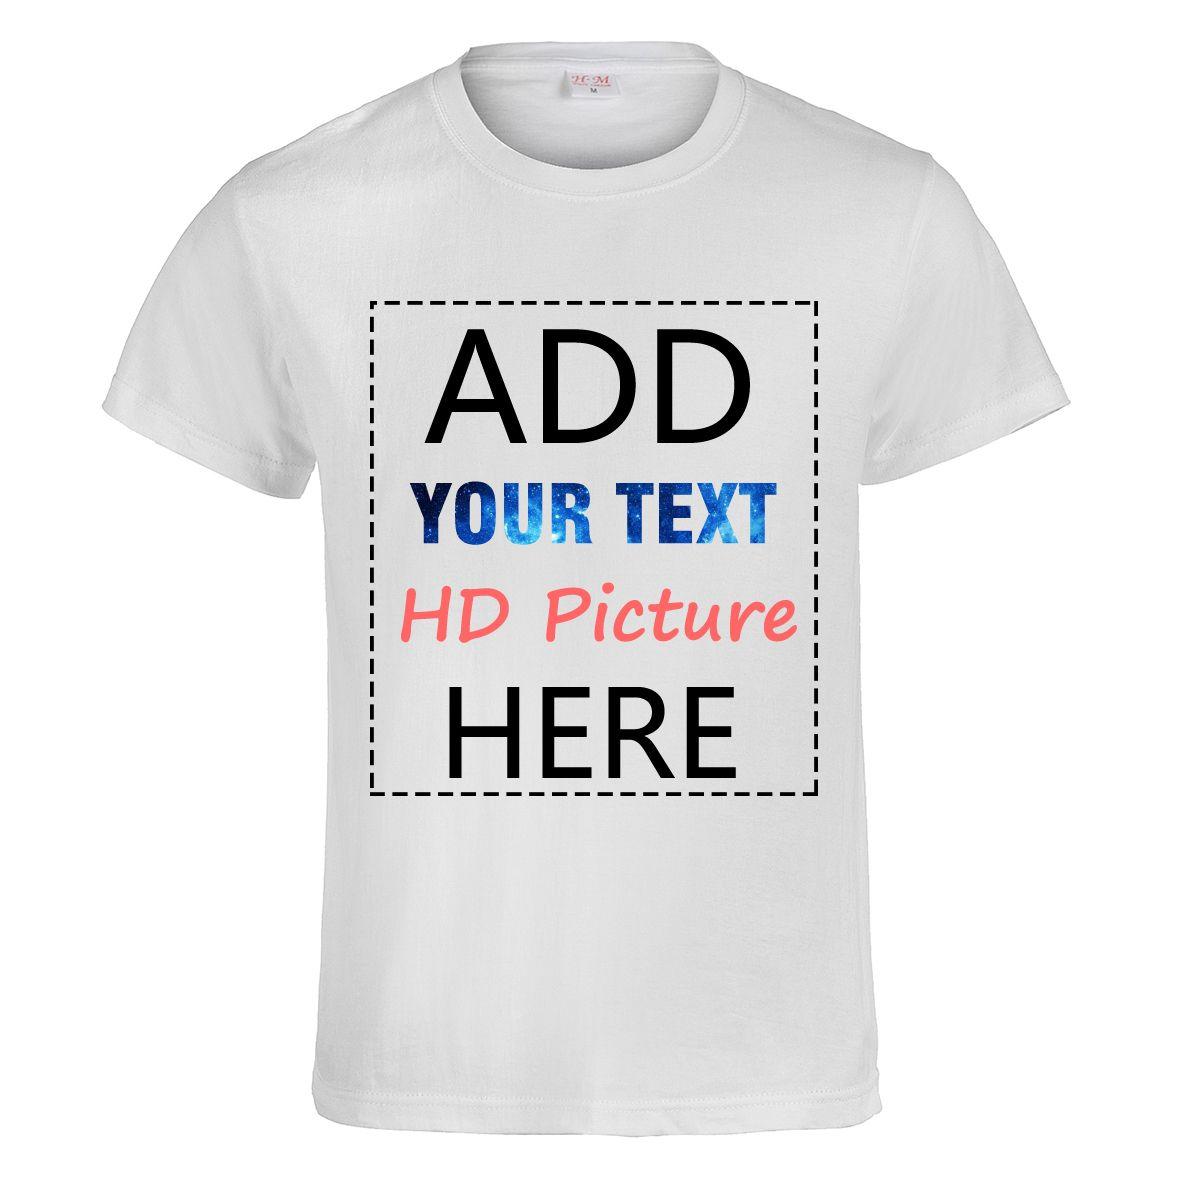 bba97138e Customized Diy T Shirt Print Your Own Design Photo Text Logo High Quality  Team Company Women Man Unisex Tee Tops T Shirt C19041101 7 T Shirt Funny  Rude T ...